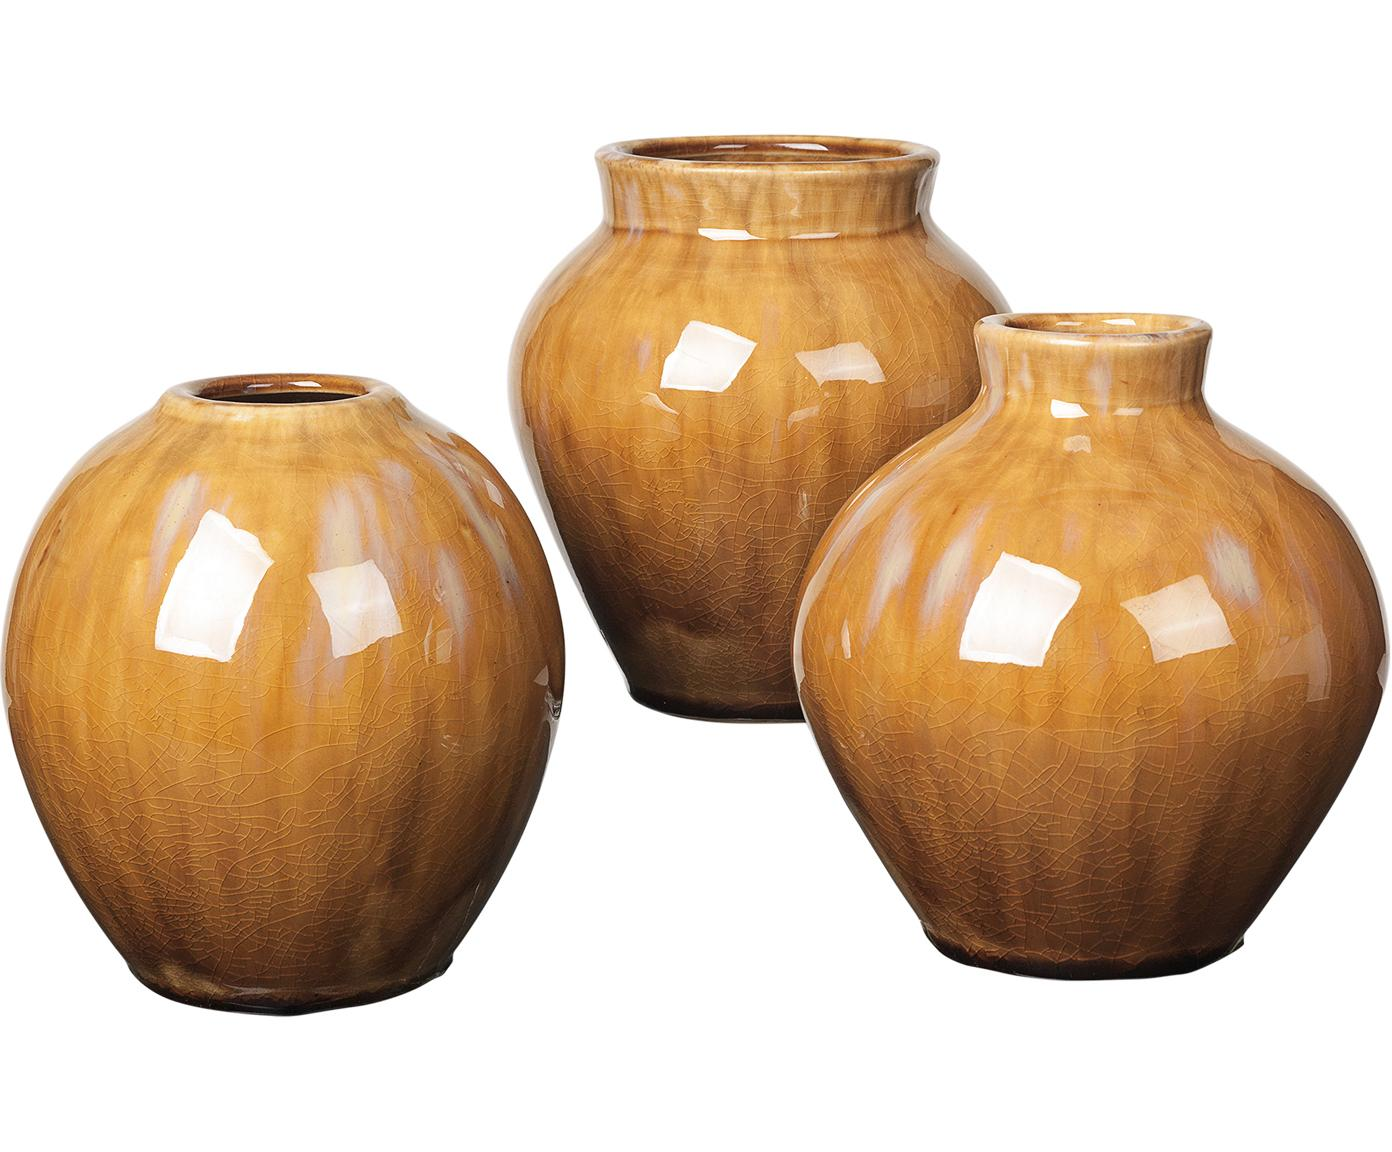 Vasen-Set Ingrid aus Keramik, 3-tlg. , Keramik, Brauntöne, Ø 14 x H 14 cm